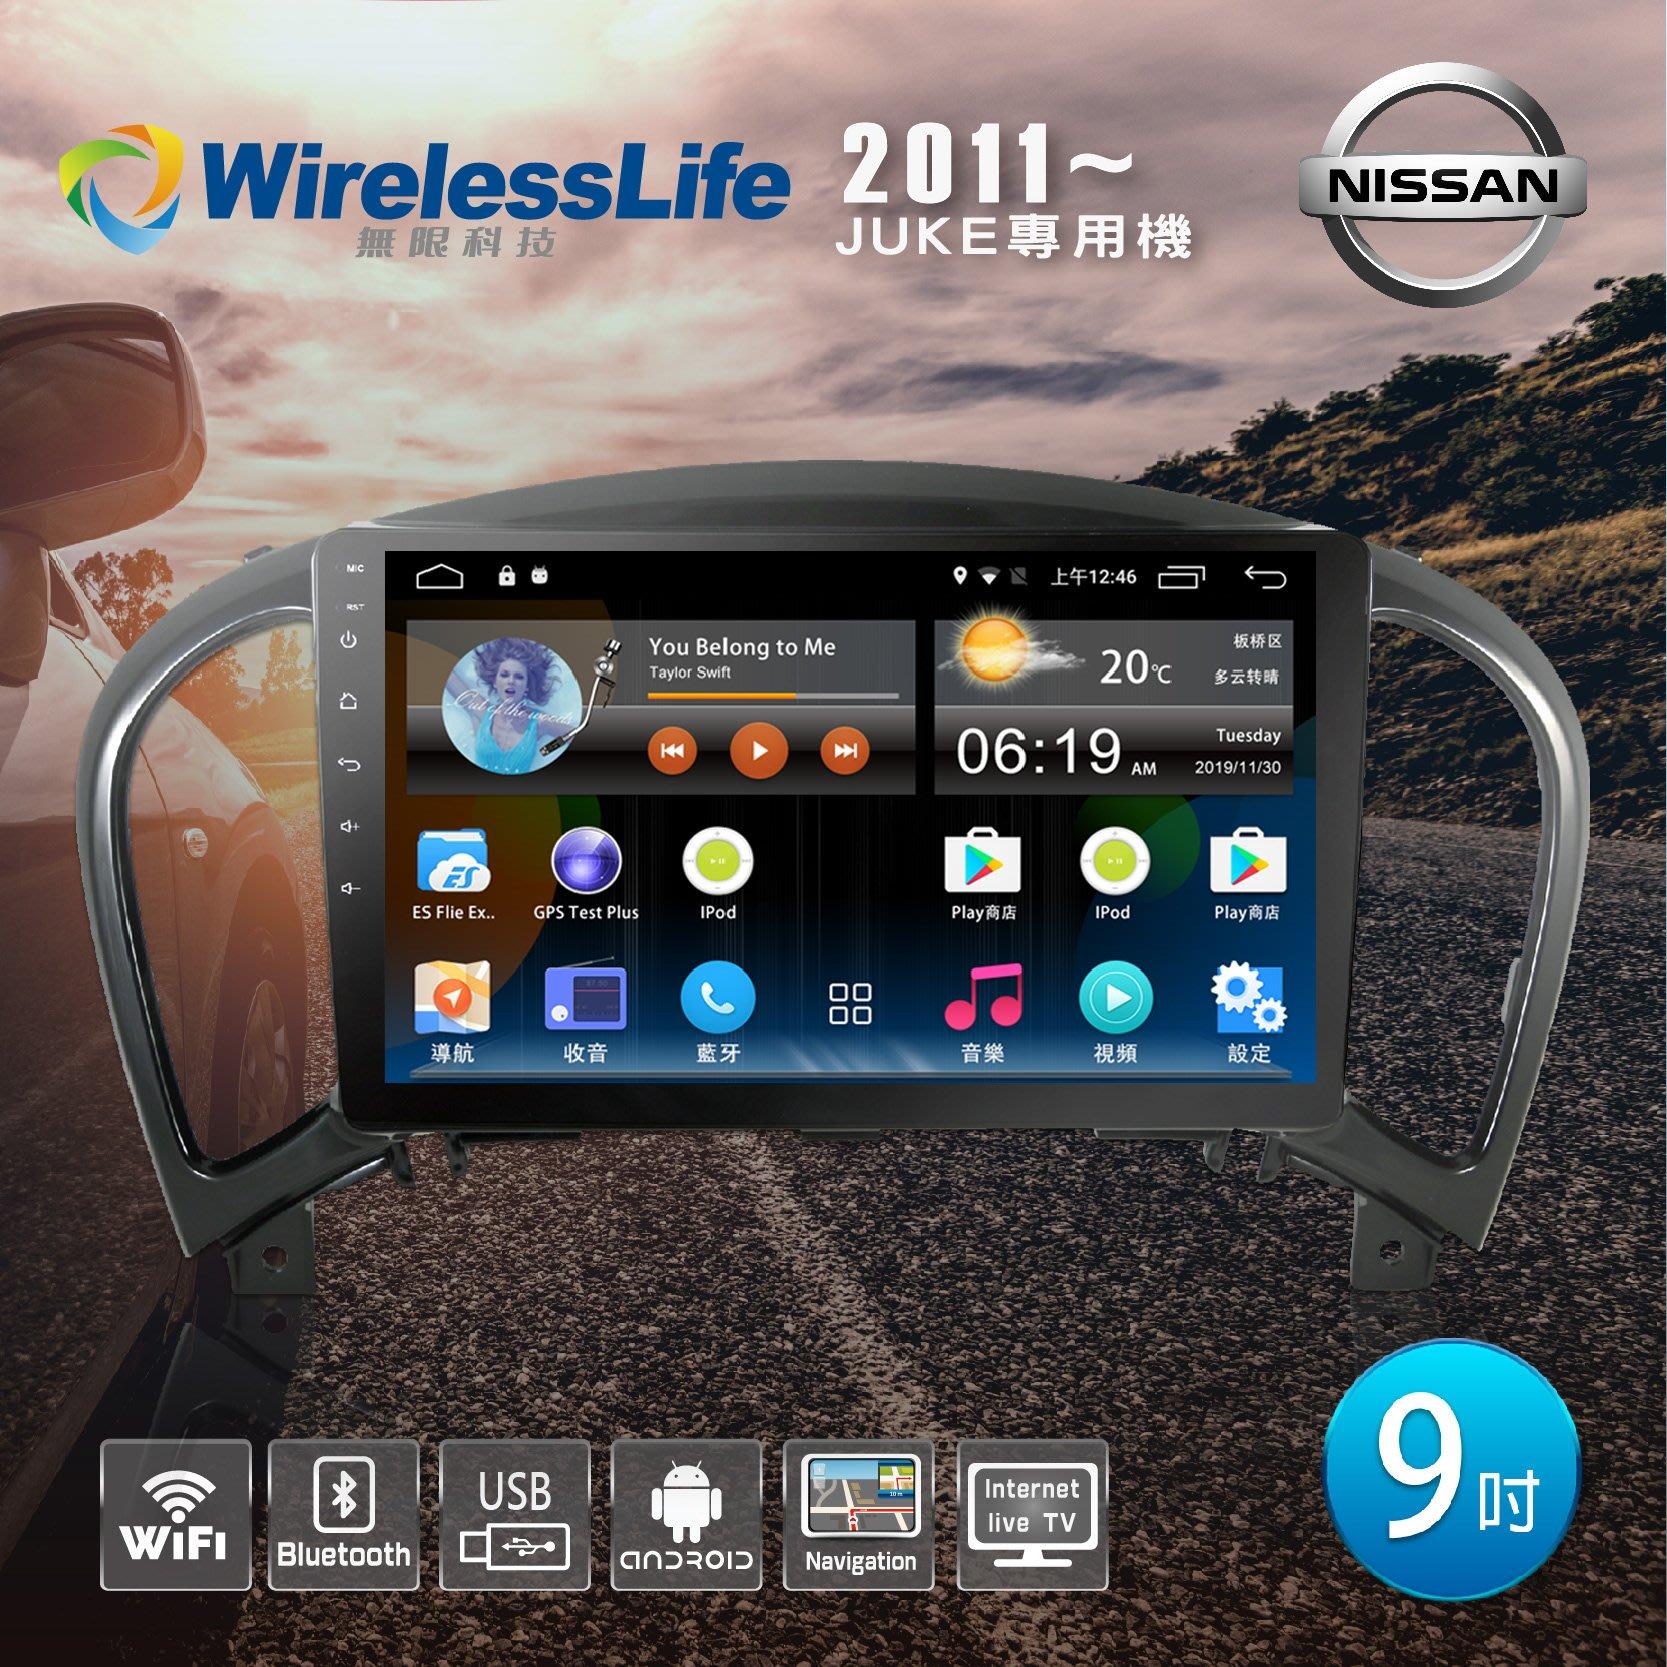 【NISSAN日產】11 JUKE專用機 9吋 多媒體安卓機 無限科技